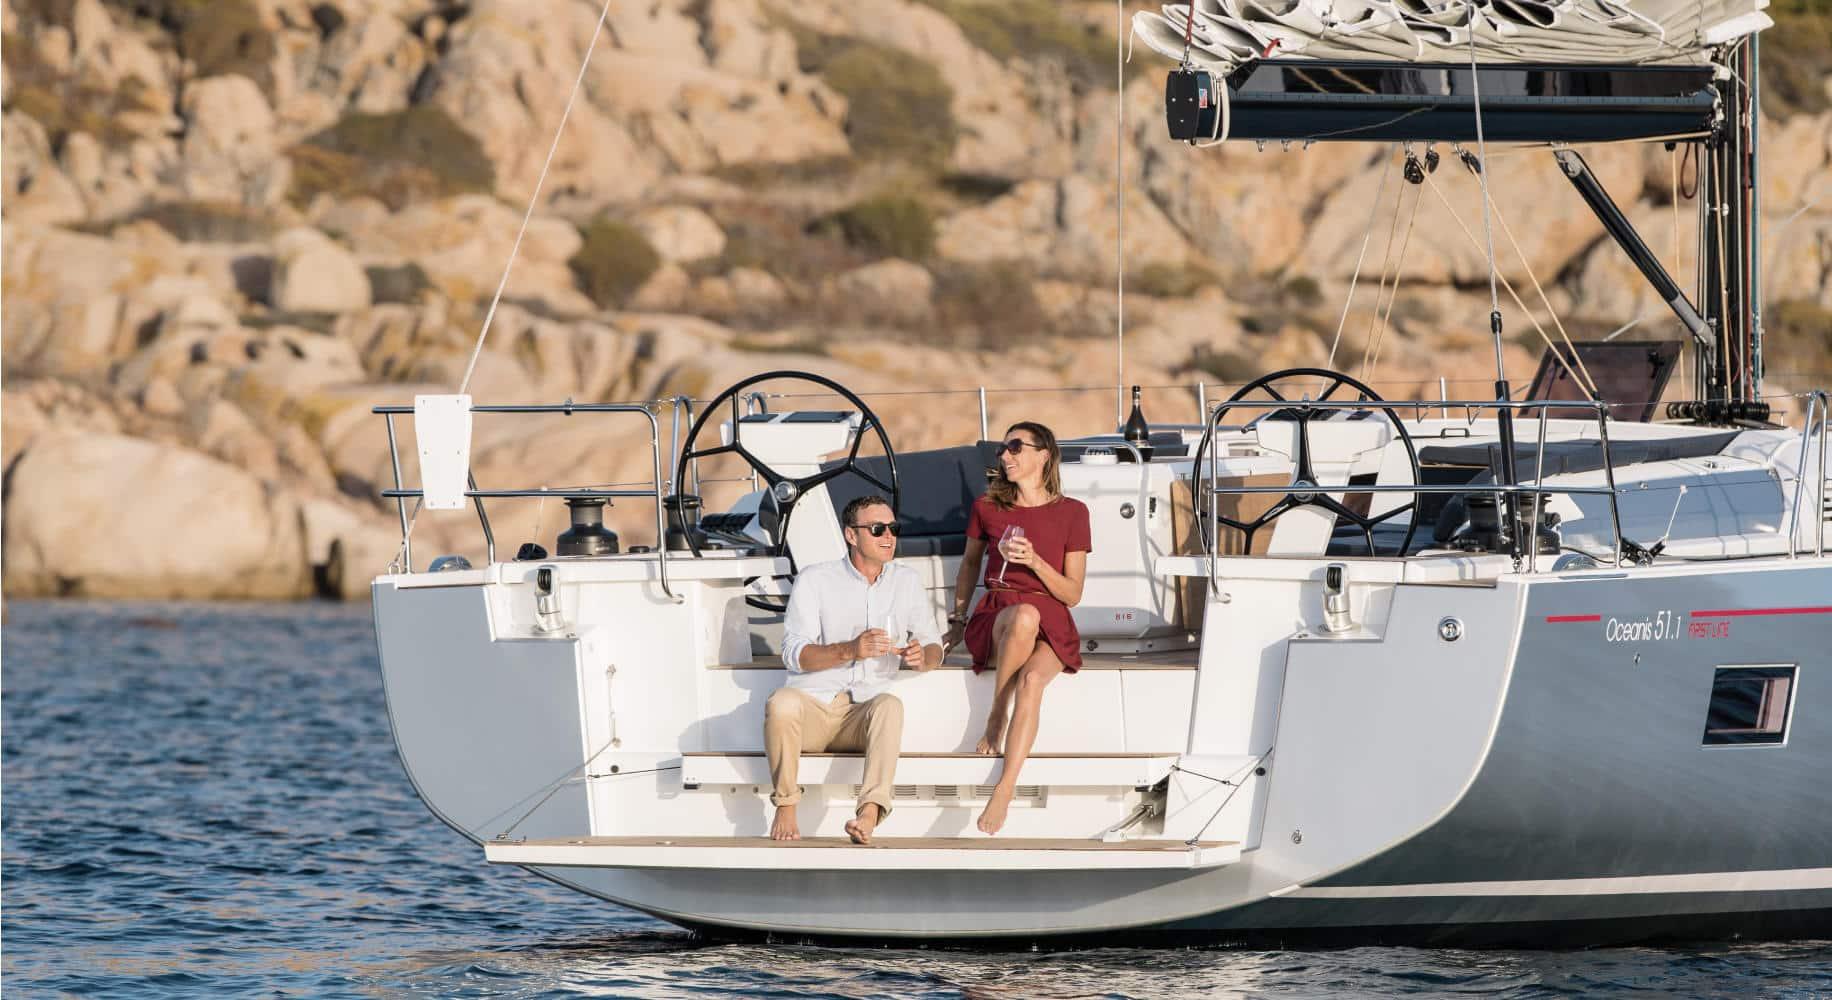 lagoon 52 s-yacht-charter-croatia-sailing-holidays-croatia-booking-yacht-charter-croatia-catamarans-sailboats-motorboats-gulets-luxury-yachts-boat-rental-croatia 16